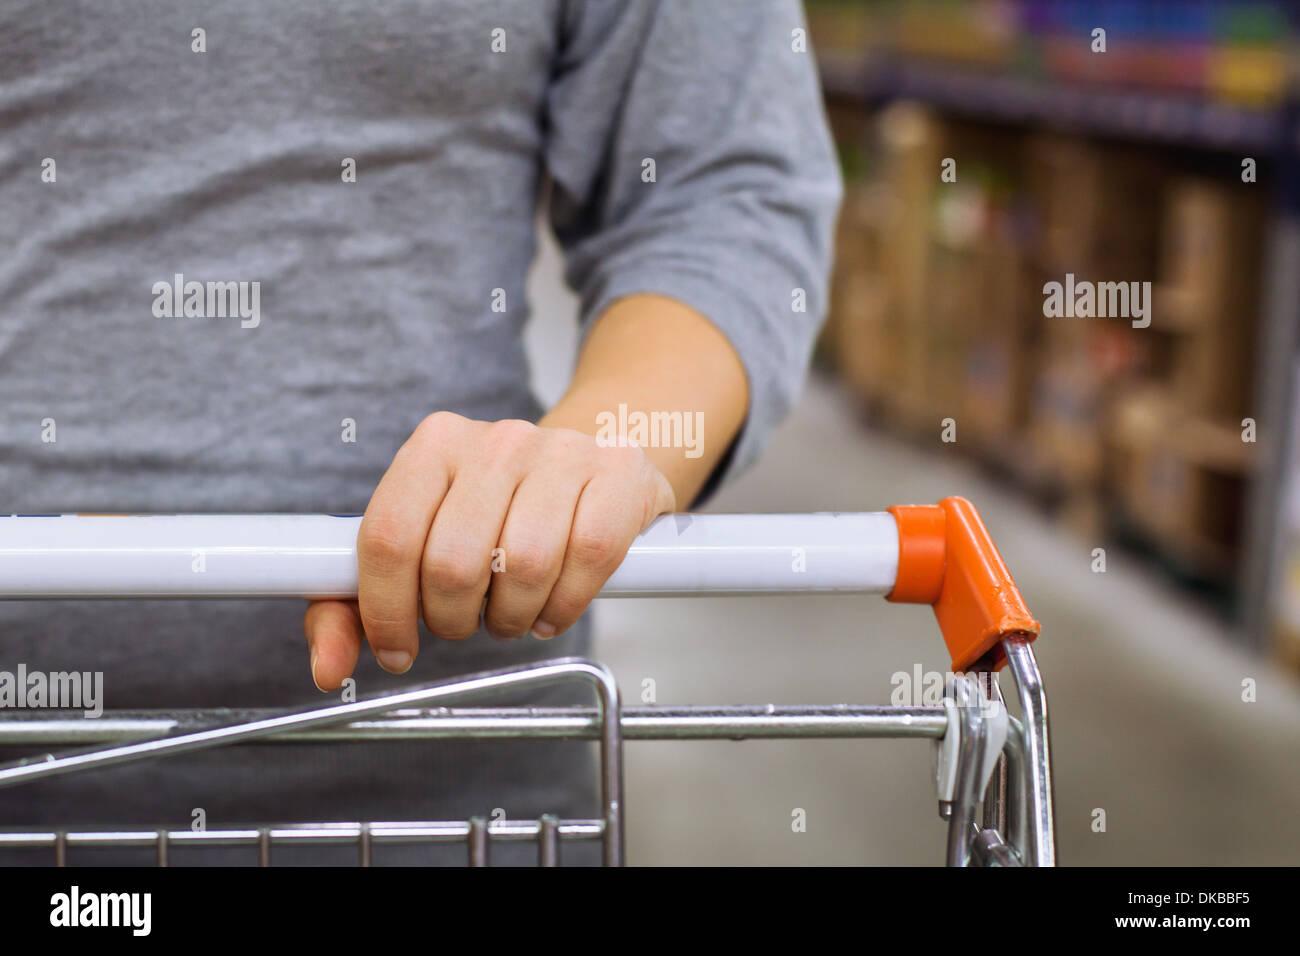 shopping cart in supermarket - Stock Image